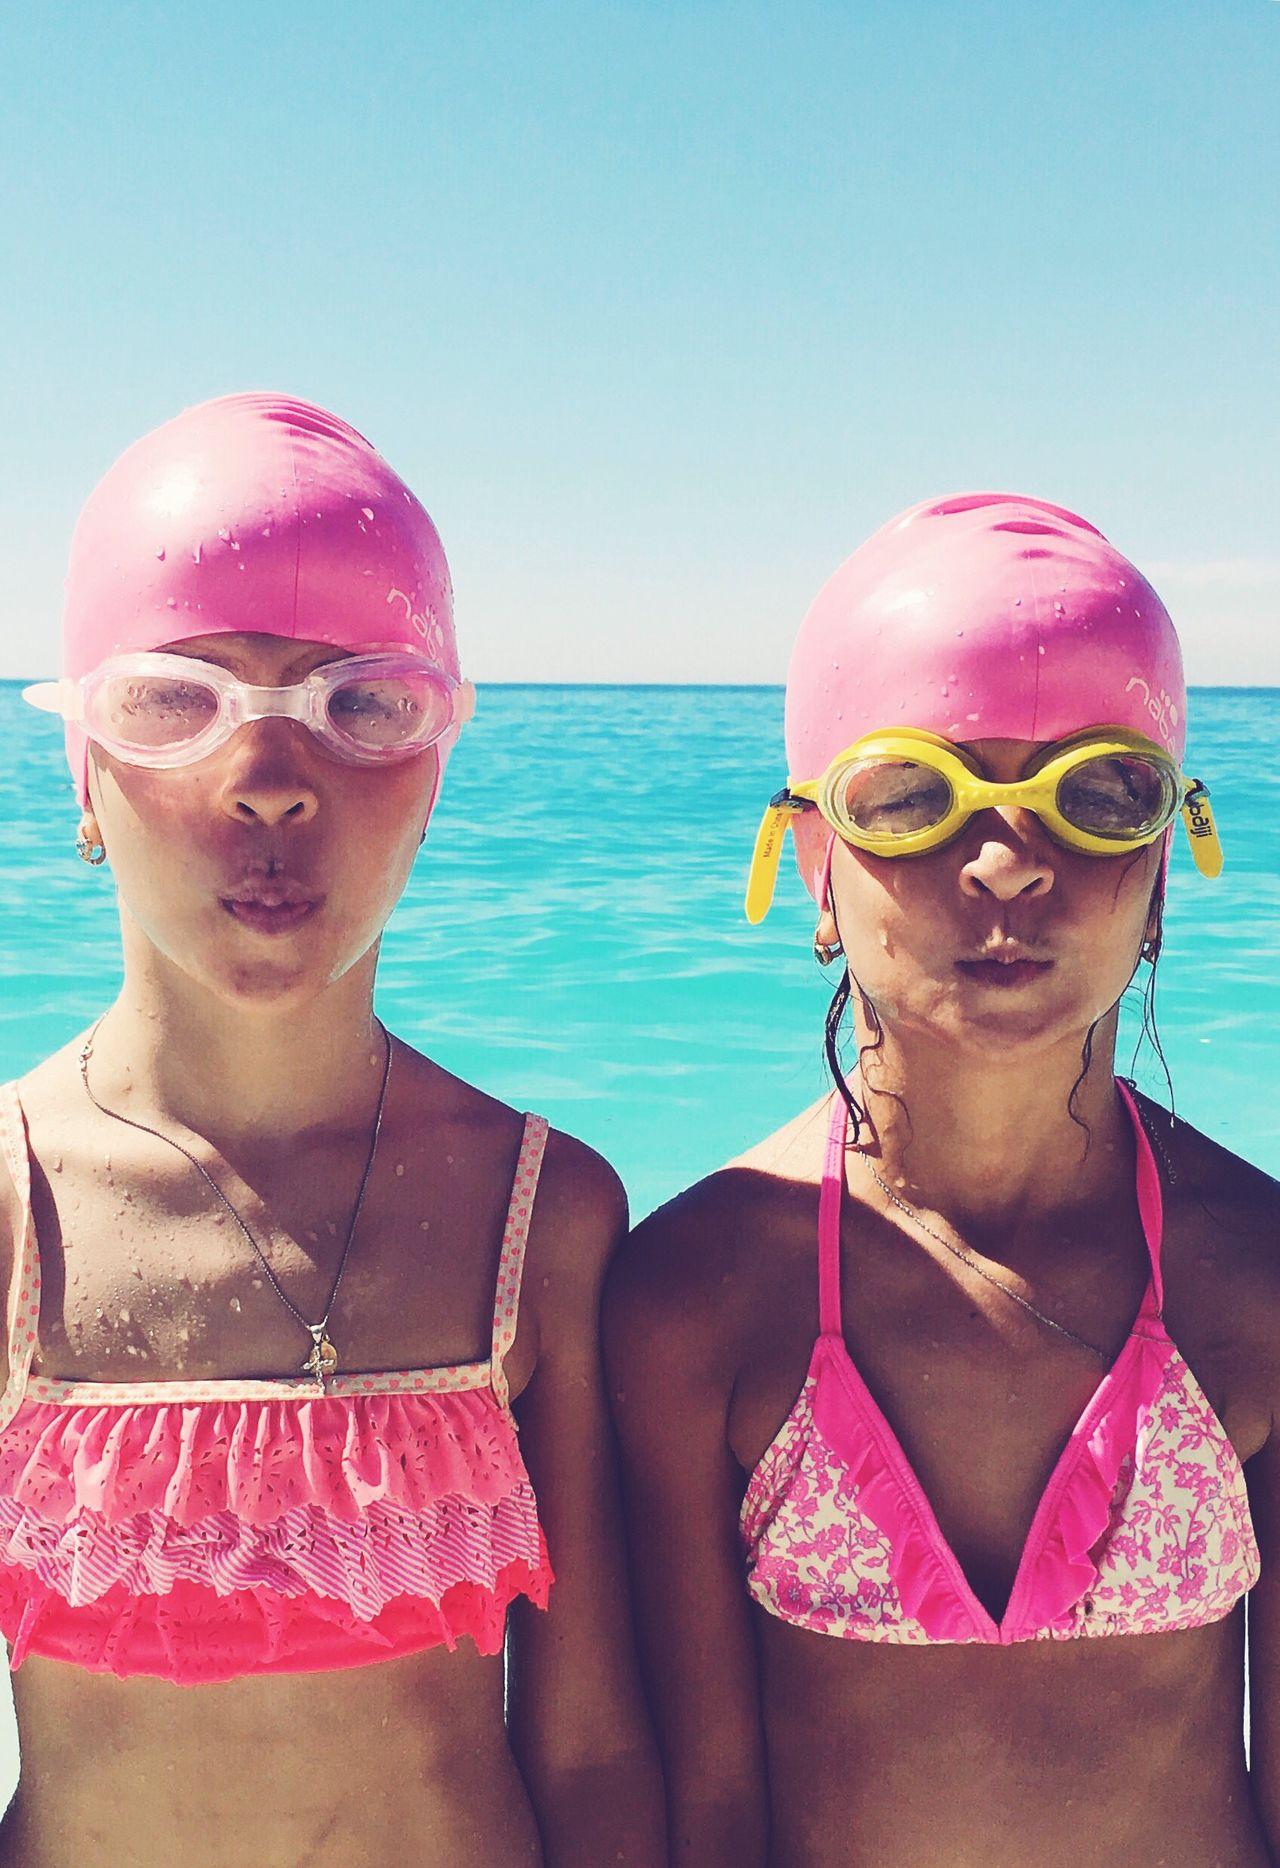 Girlsinpink Photography Sisters Sea And Sky Withmyfriends Beachphotography Retro August Greece Sun Blue Water Onthebeach Myrtosbeach Feelinghappy  Fresh On Eyeem